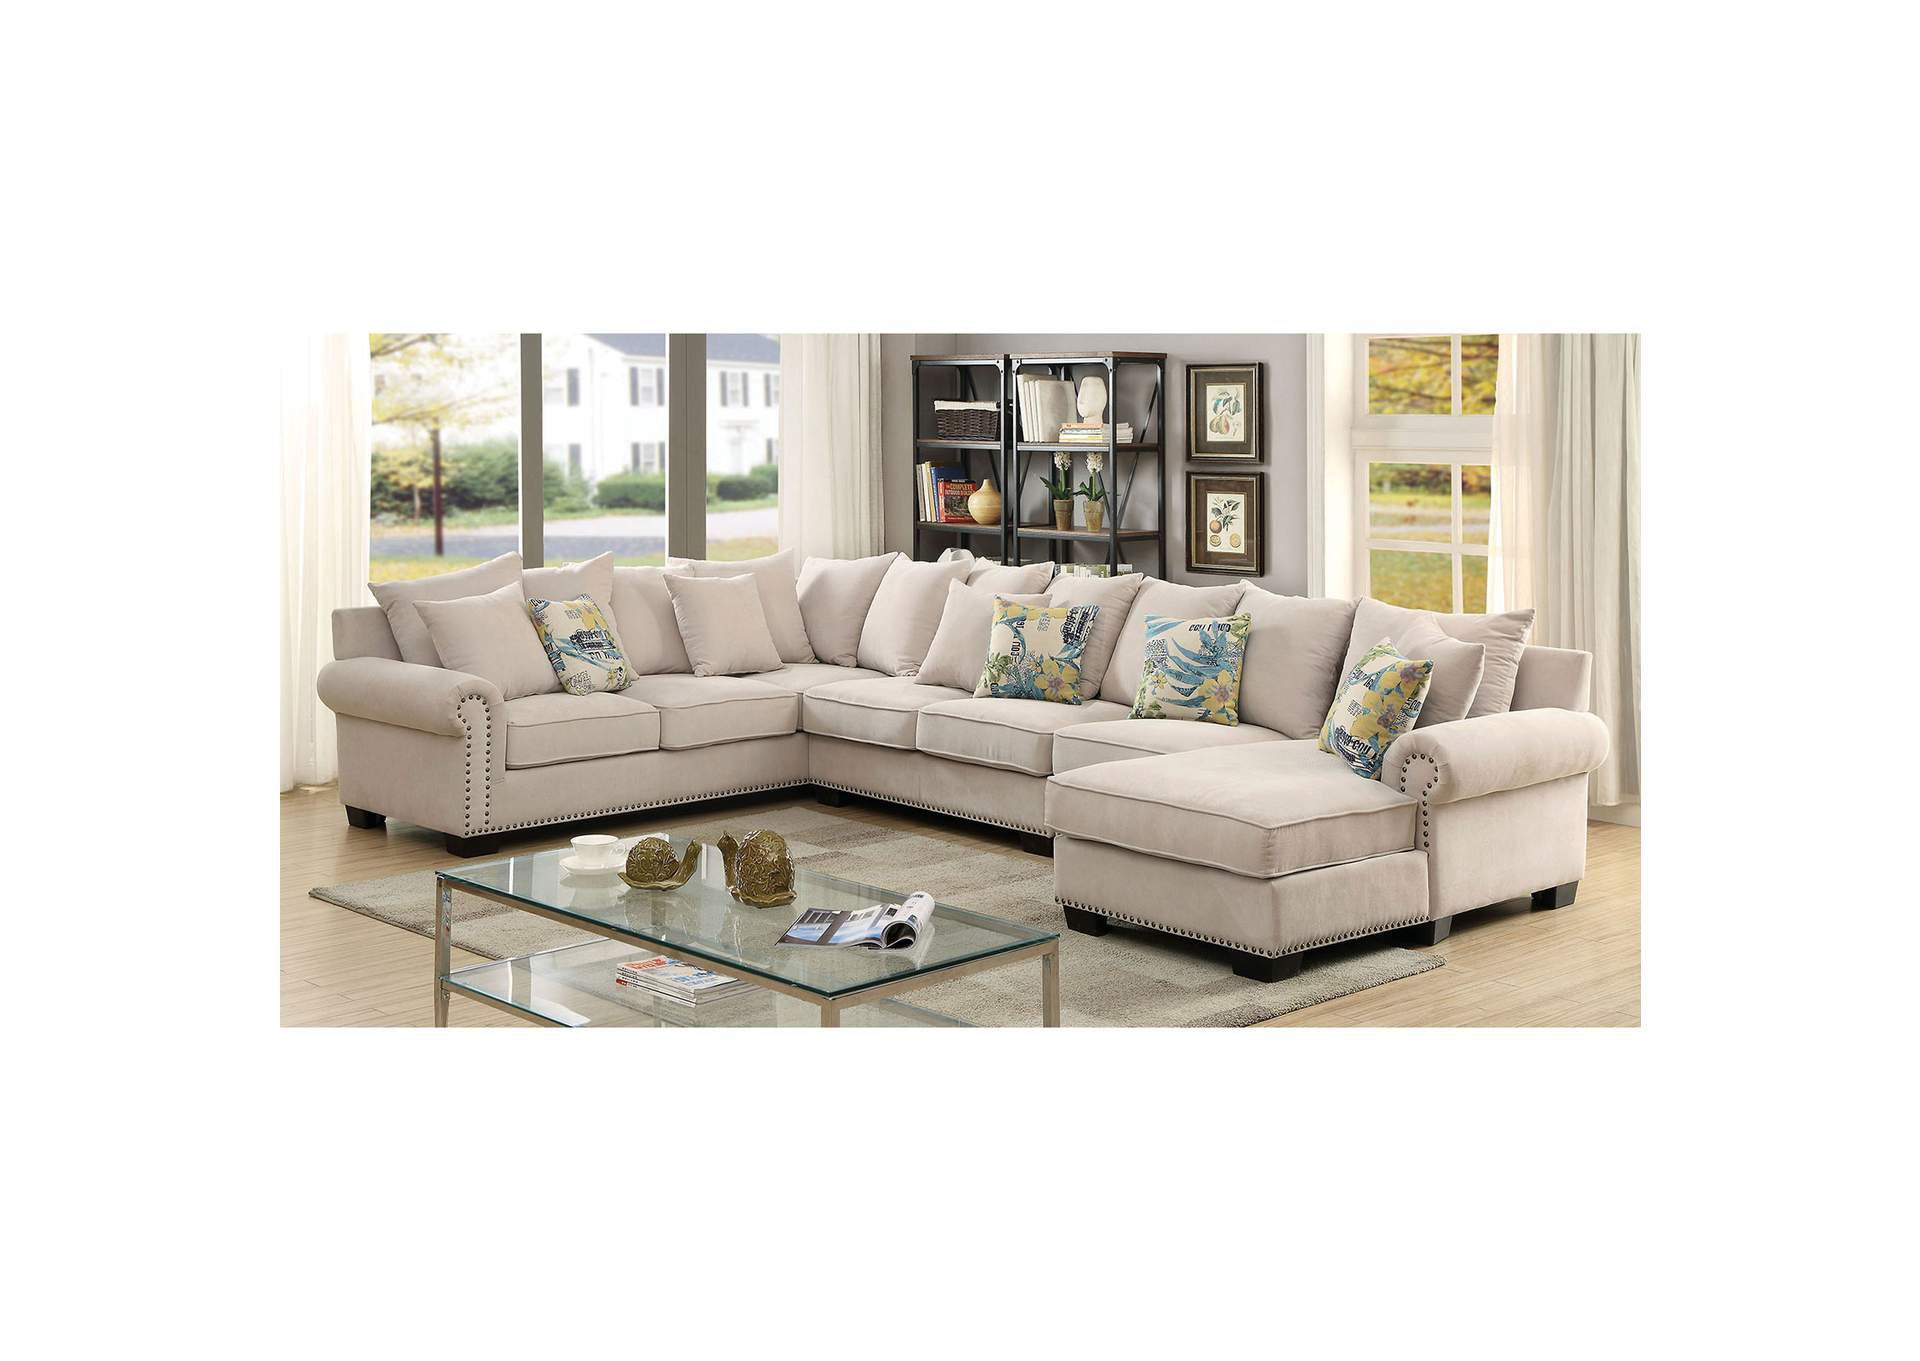 Living Room Sets In The Bronx living room set bronx ny. cheap living room sets bronx ny high